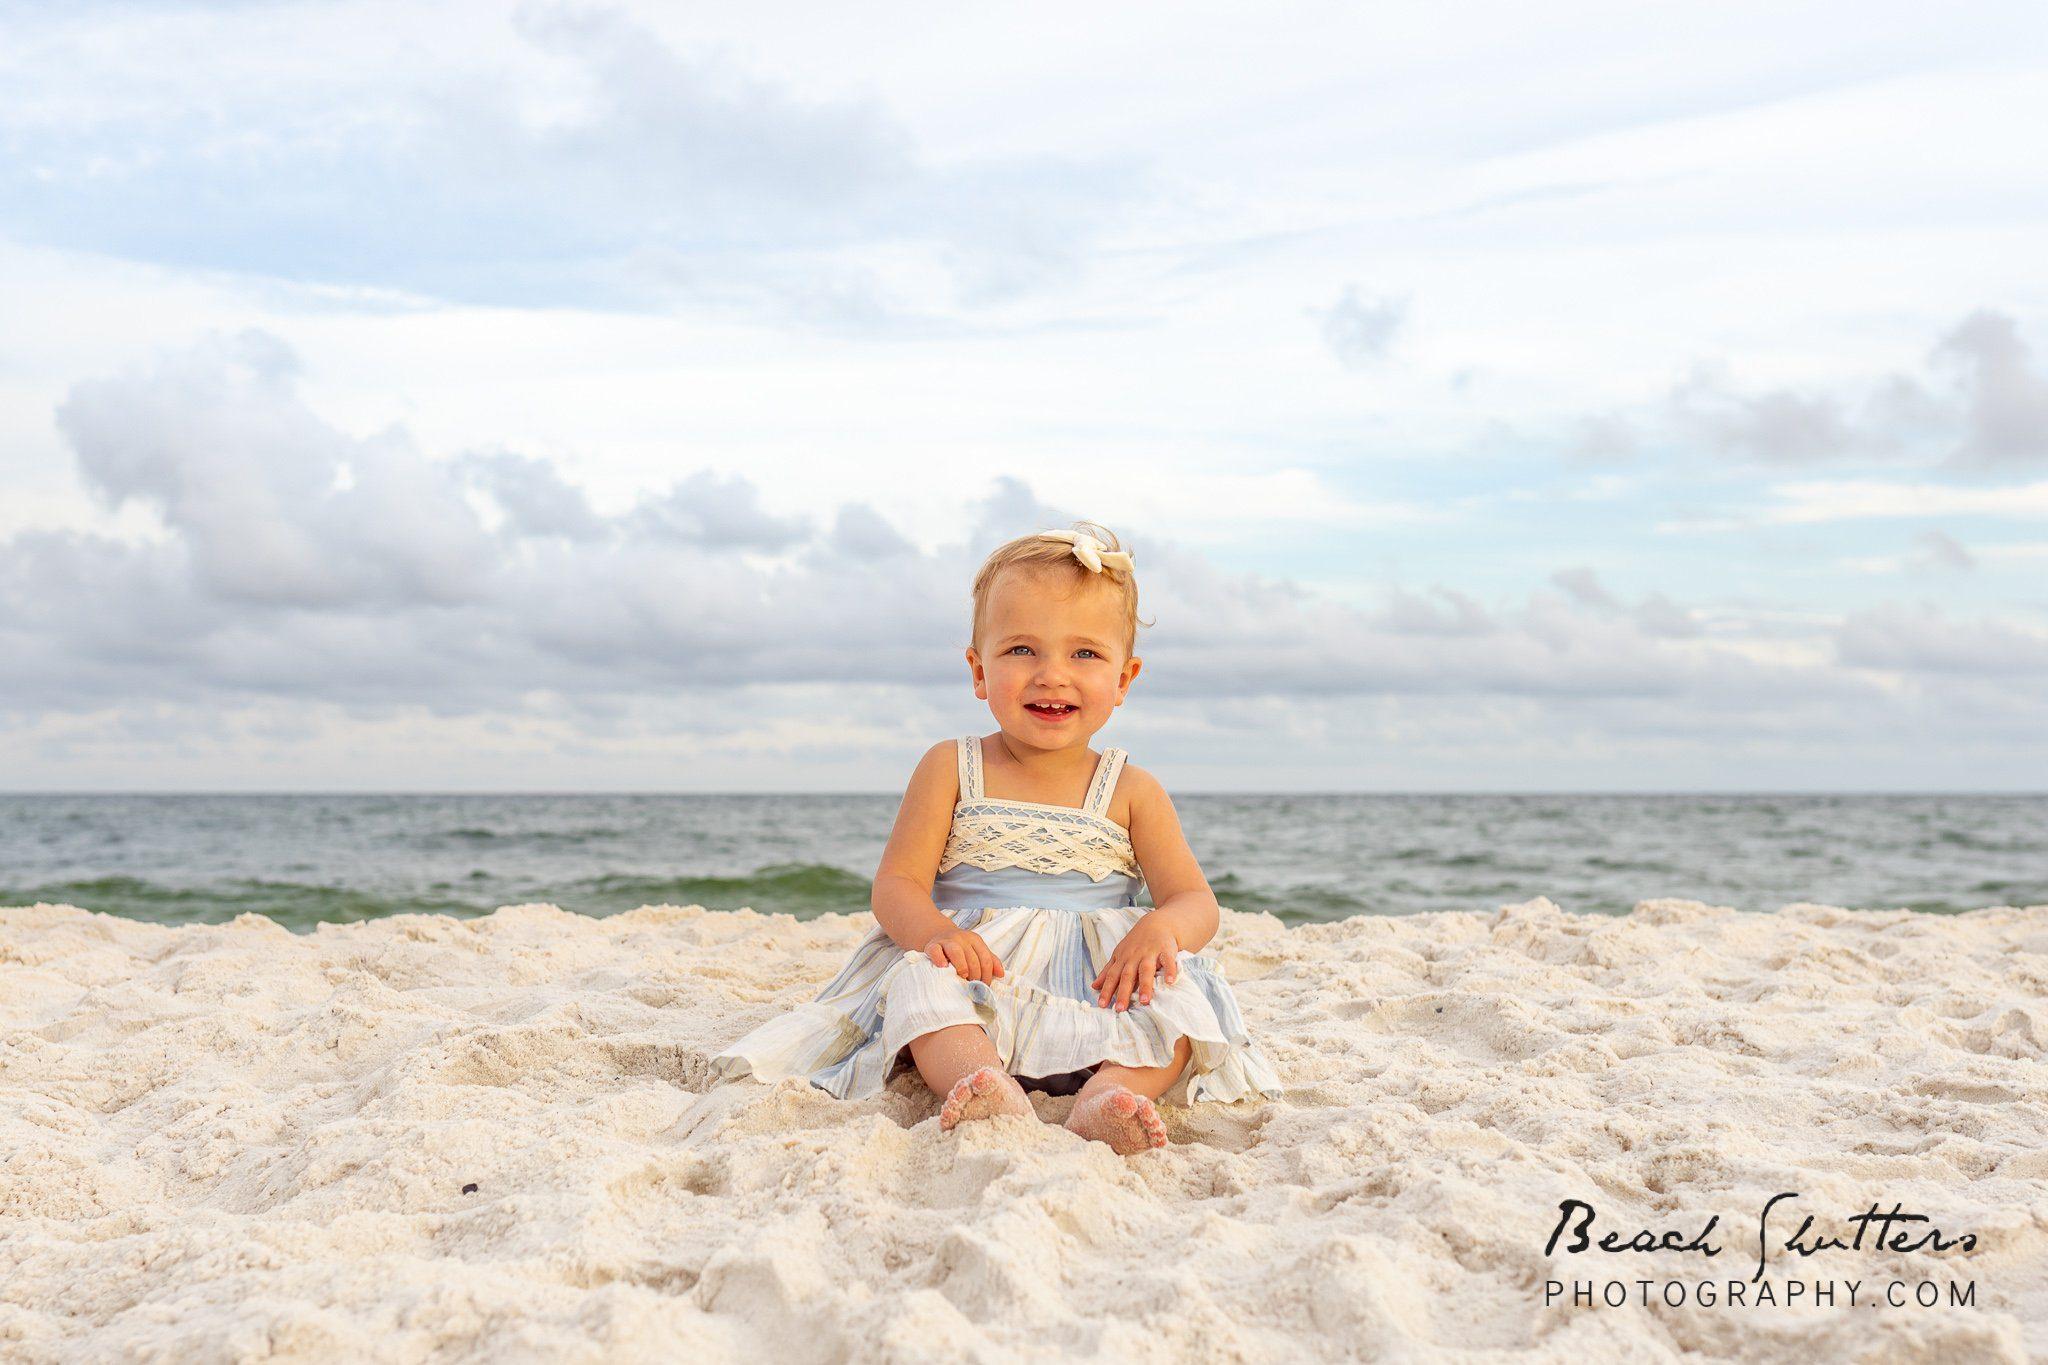 beach clothing in Alabama